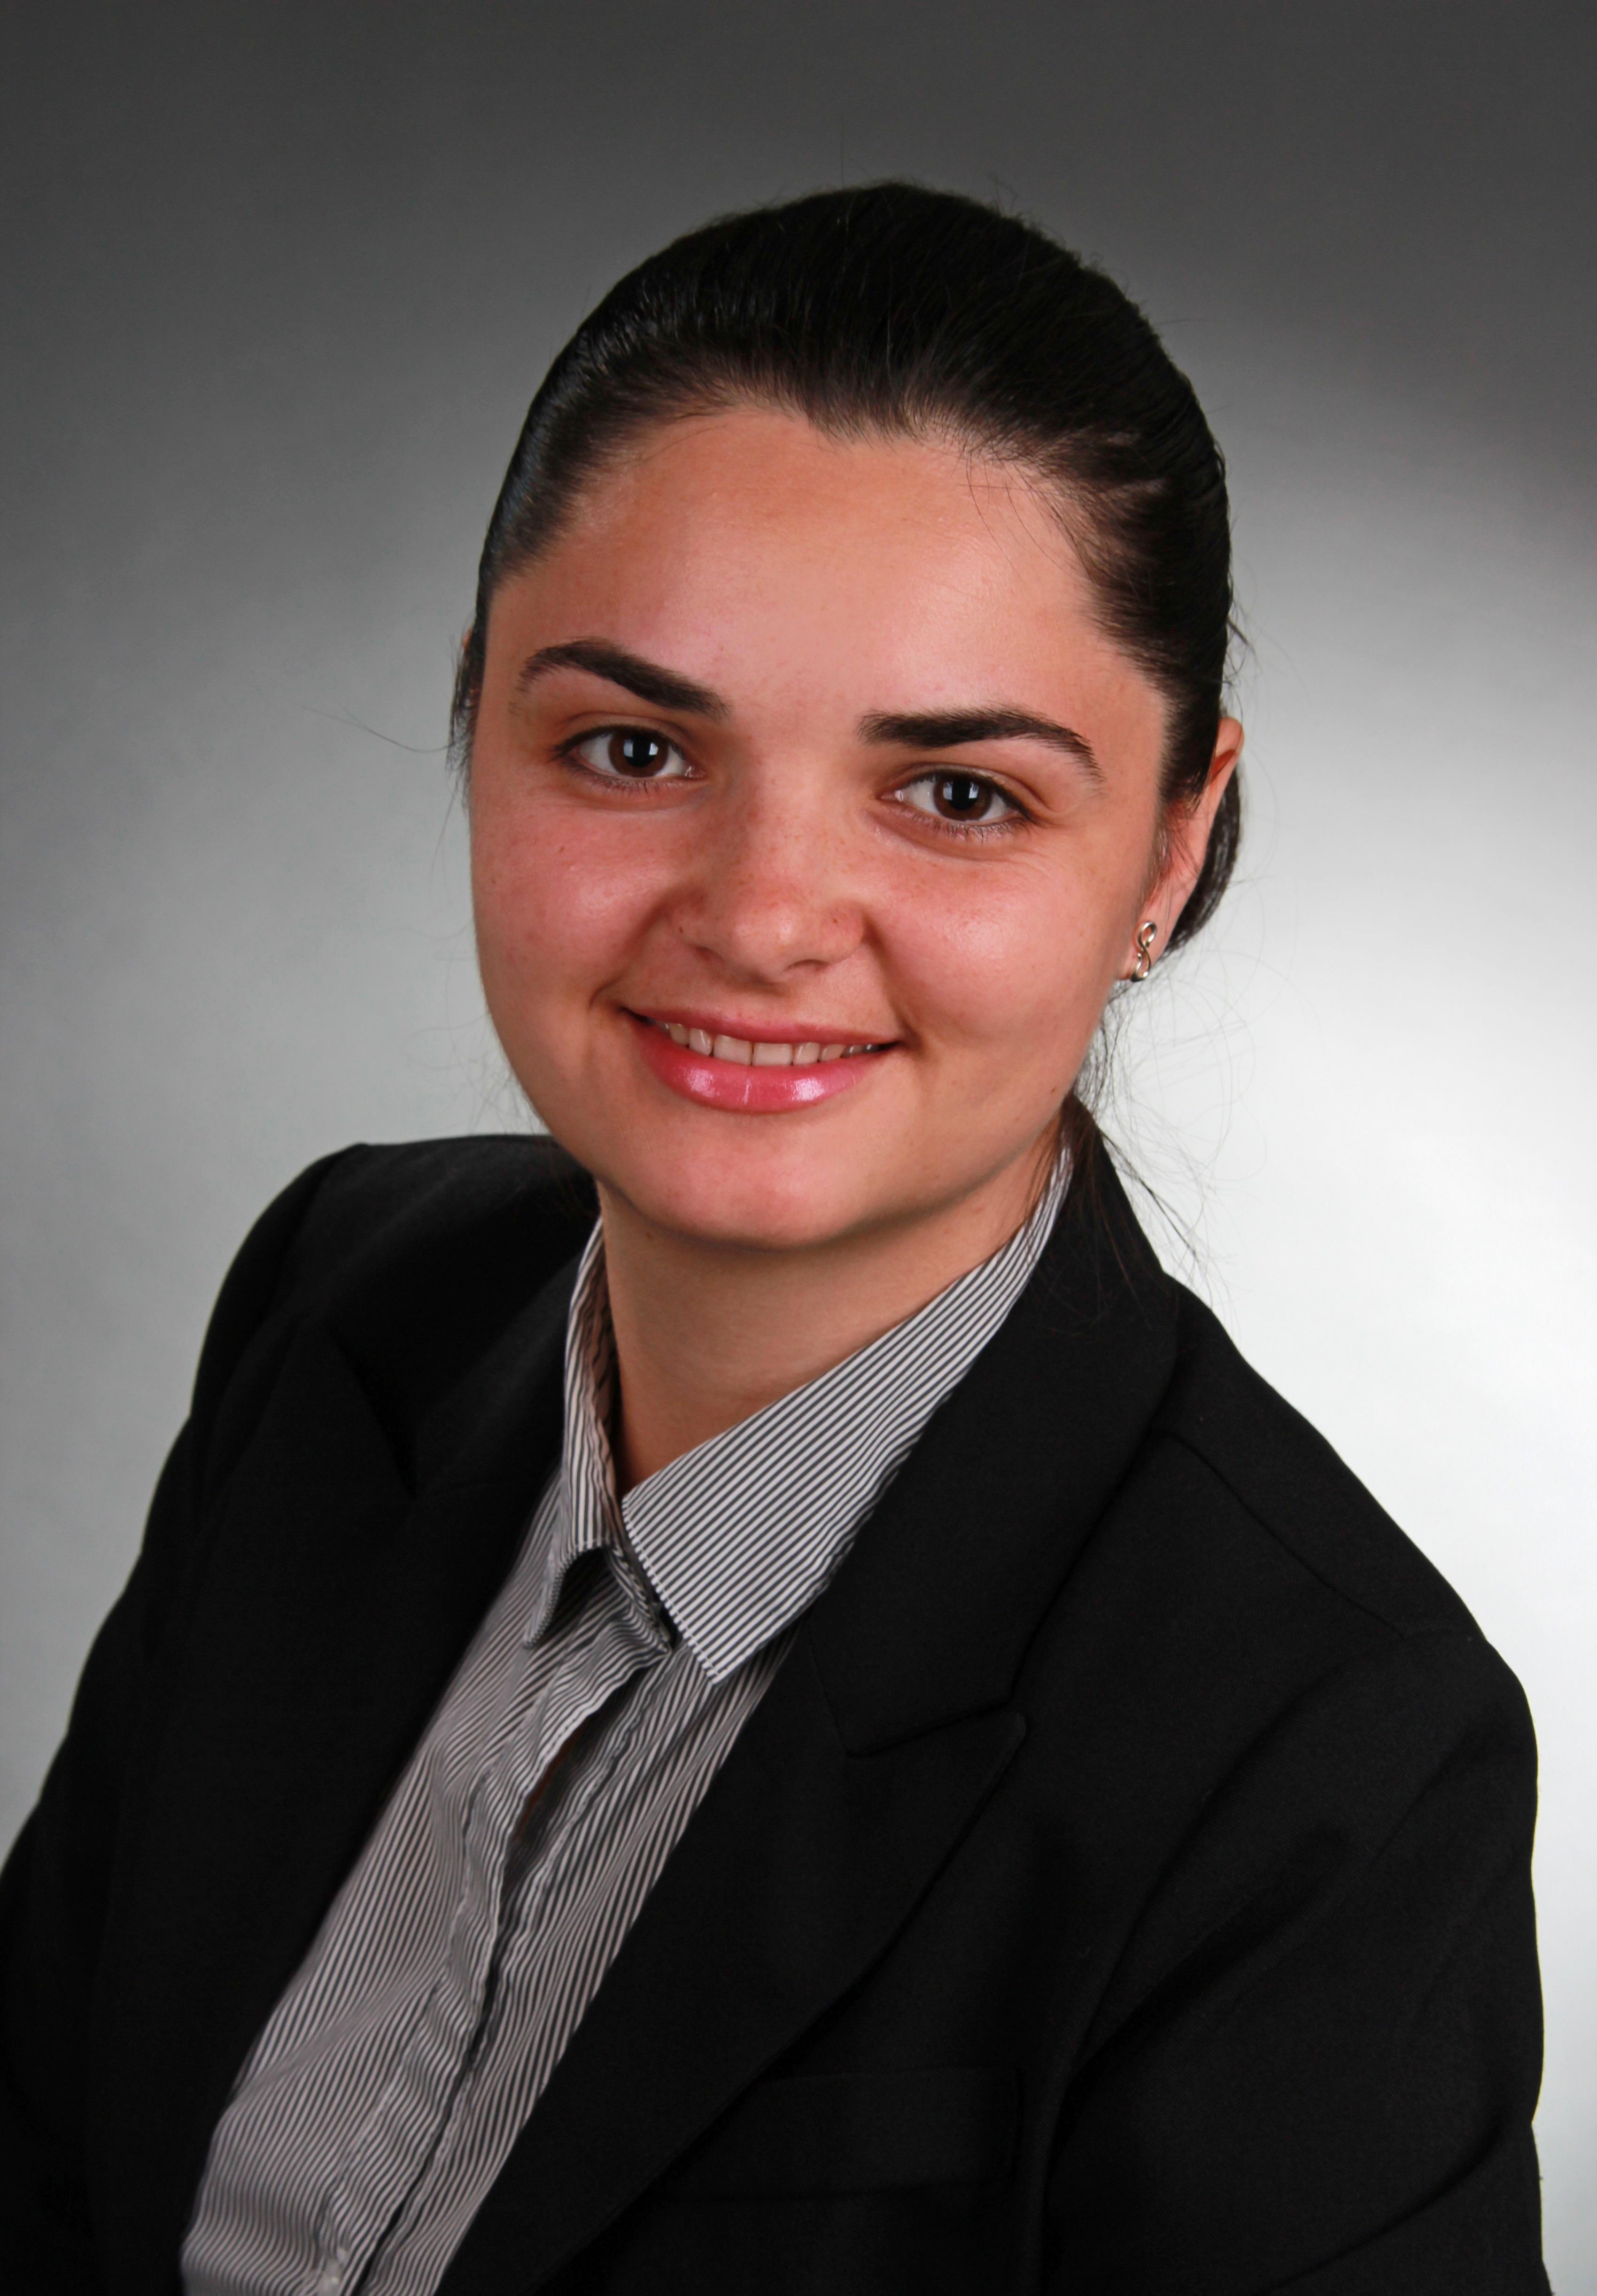 Diana Hulea